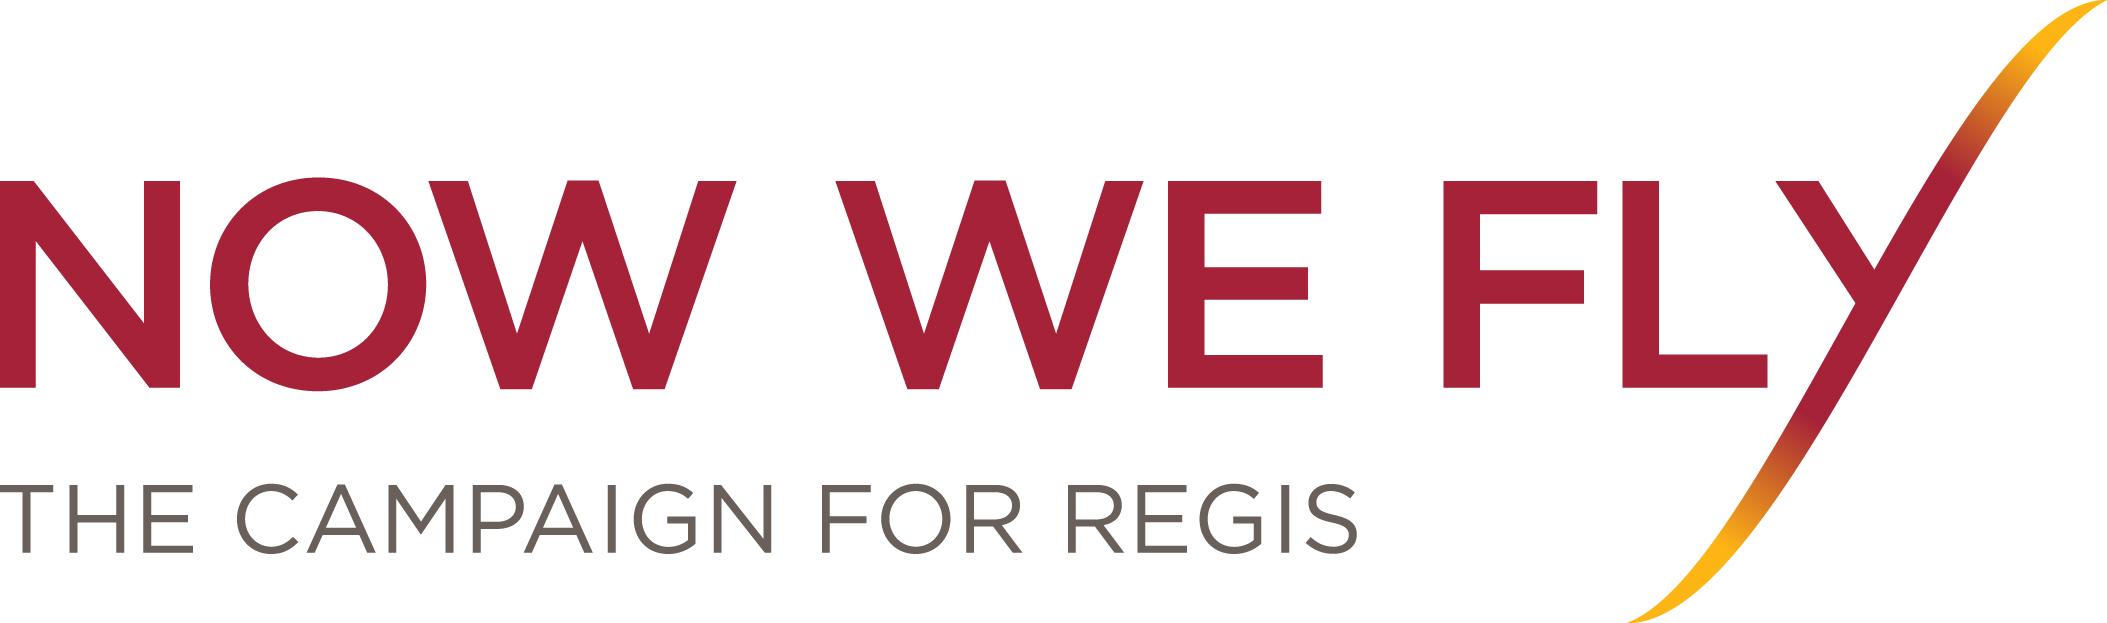 NWF gradient logo